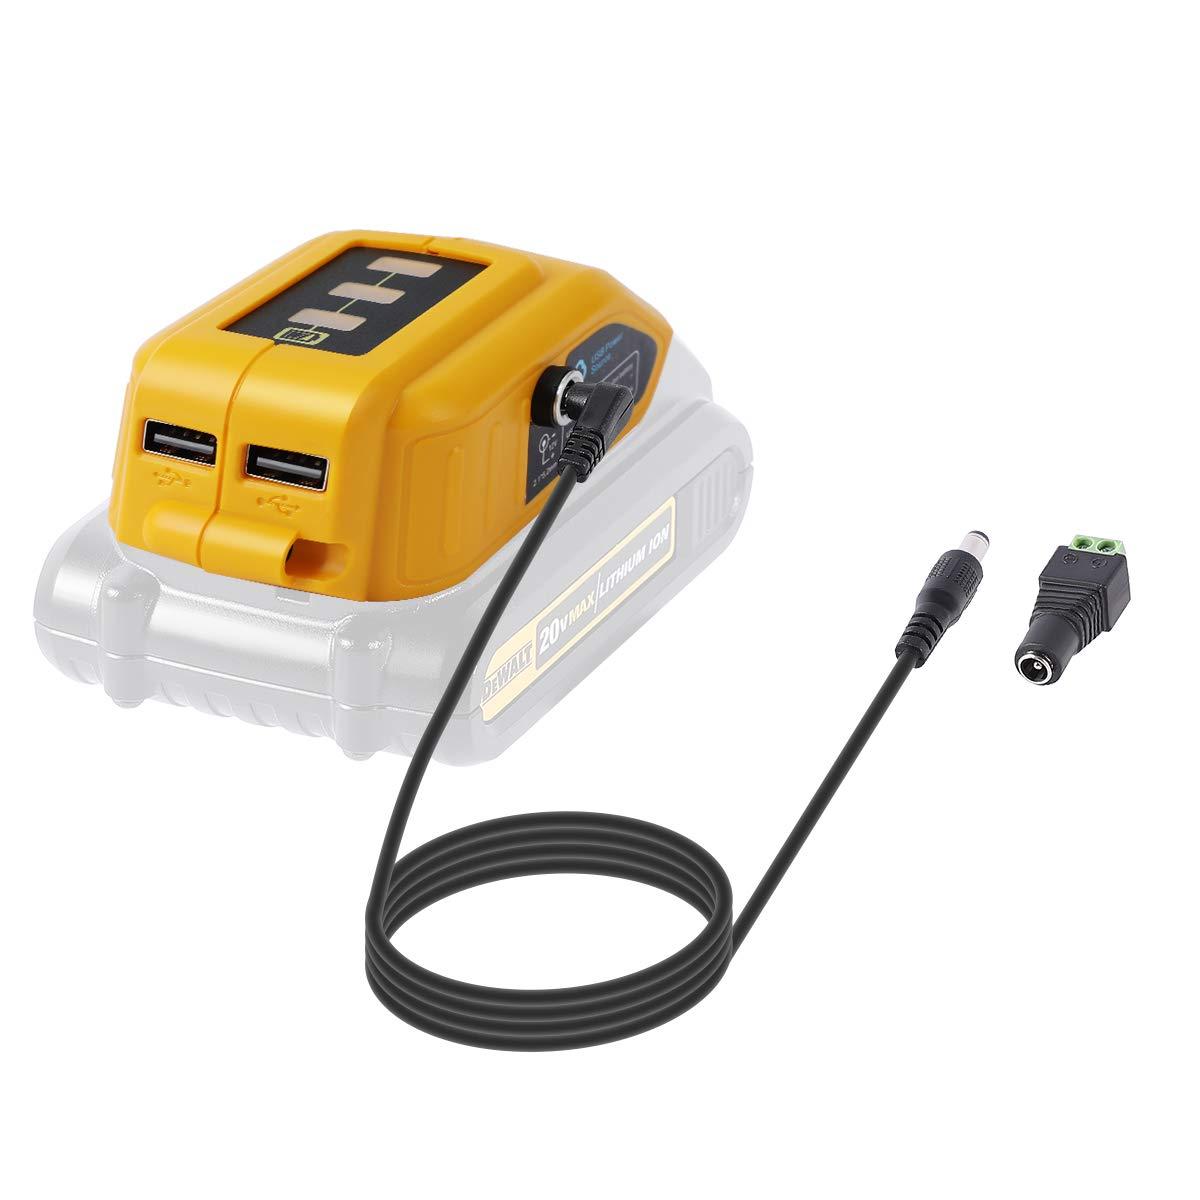 LANMU Battery Adapter for Dewalt 18V/20V Lithium Ion Battery,TS100 Soldering Iron,USB Charger for Dewalt,Power Source,Power Supply for Dewalt DCB090 DCB091 (Yellow)